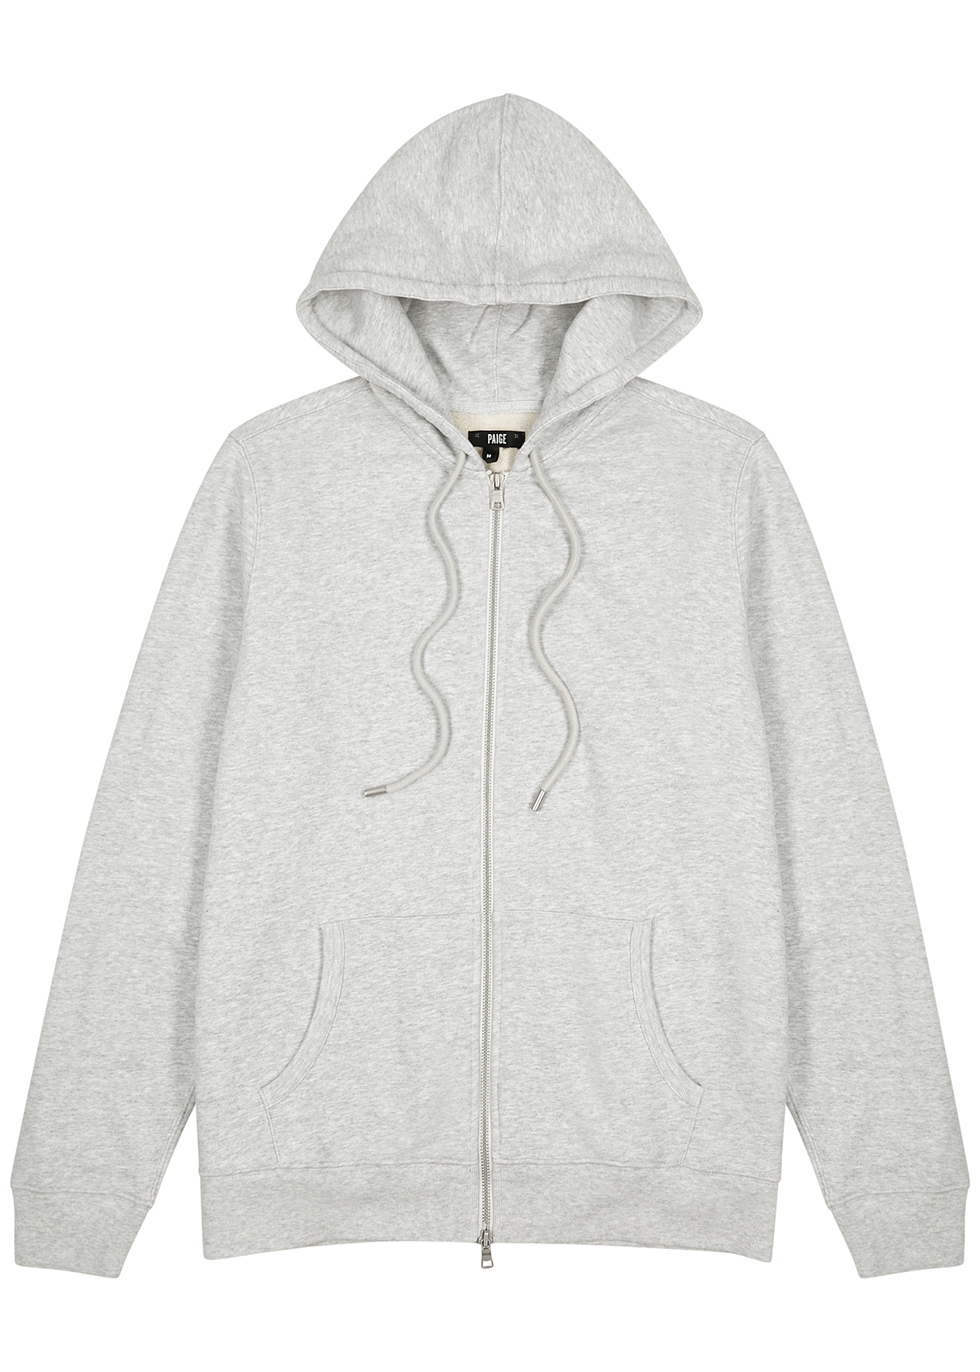 Ruder grey hooded cotton sweatshirt